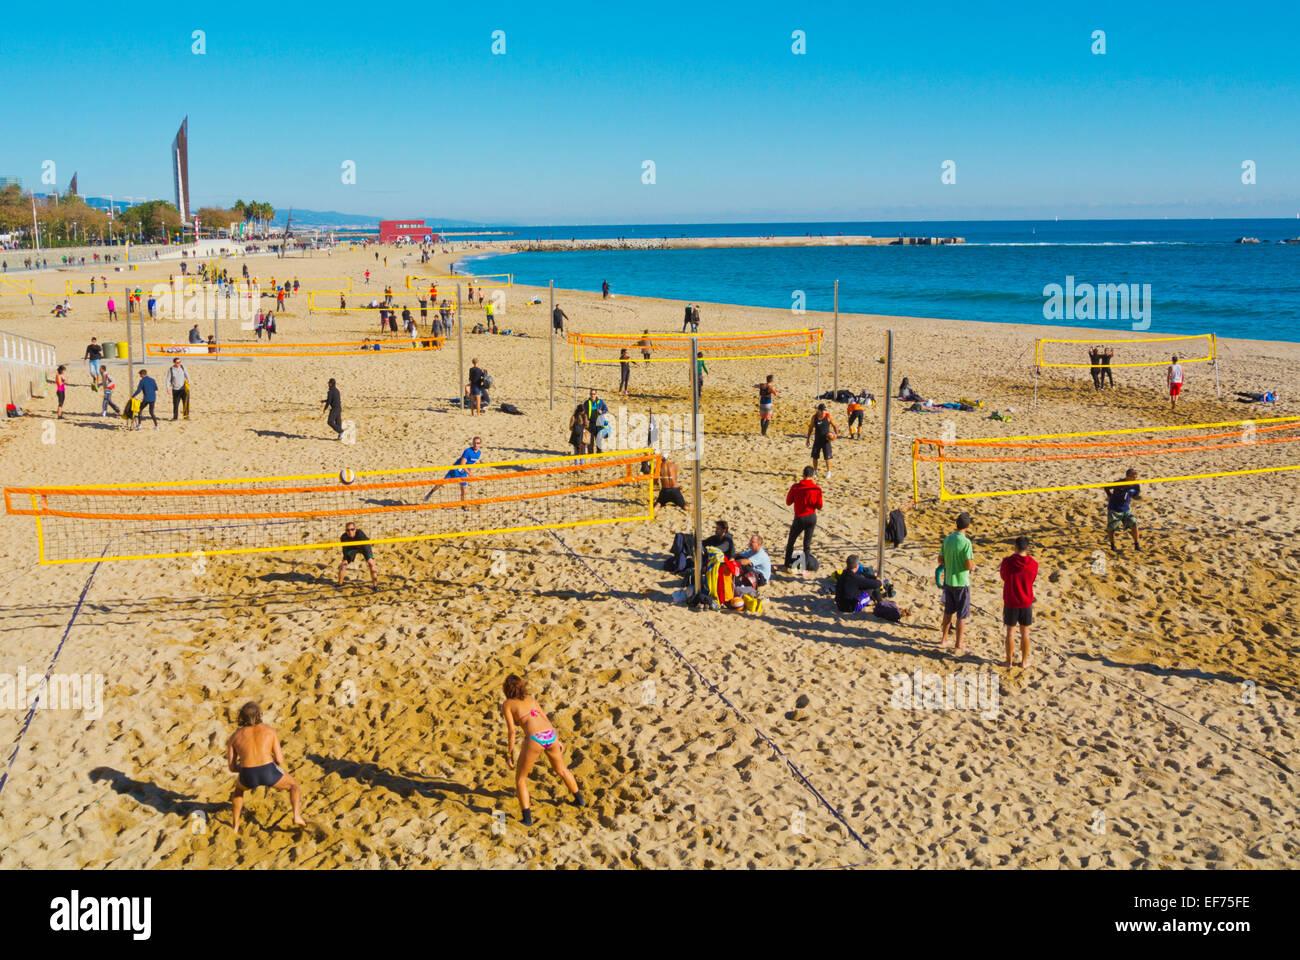 Voleibol de playa, playa Platja Nova Icaria, Barcelona, España Imagen De Stock